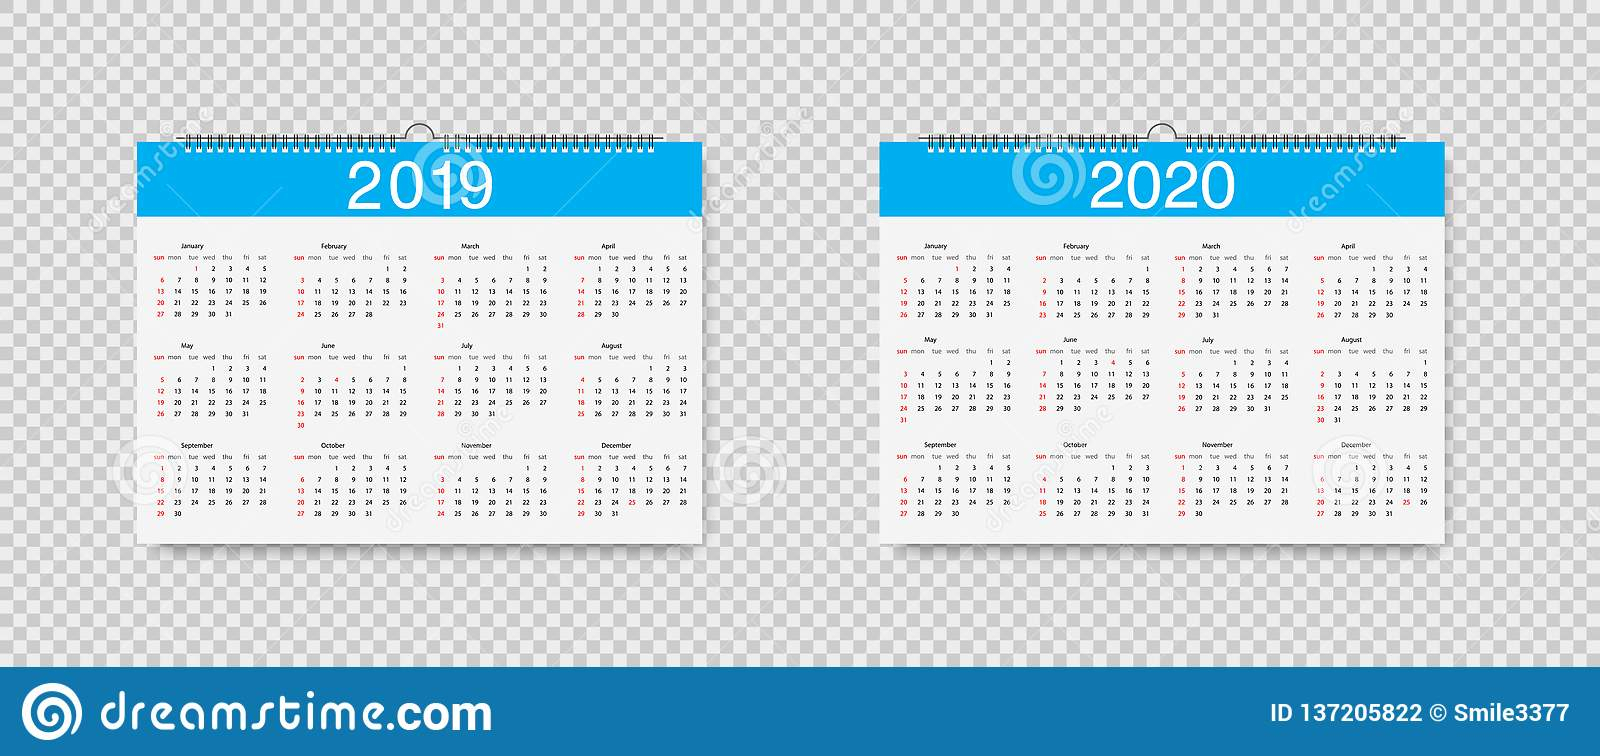 Календарь Вектора 2019 И 2020 Лет Календари Шаблона Loose